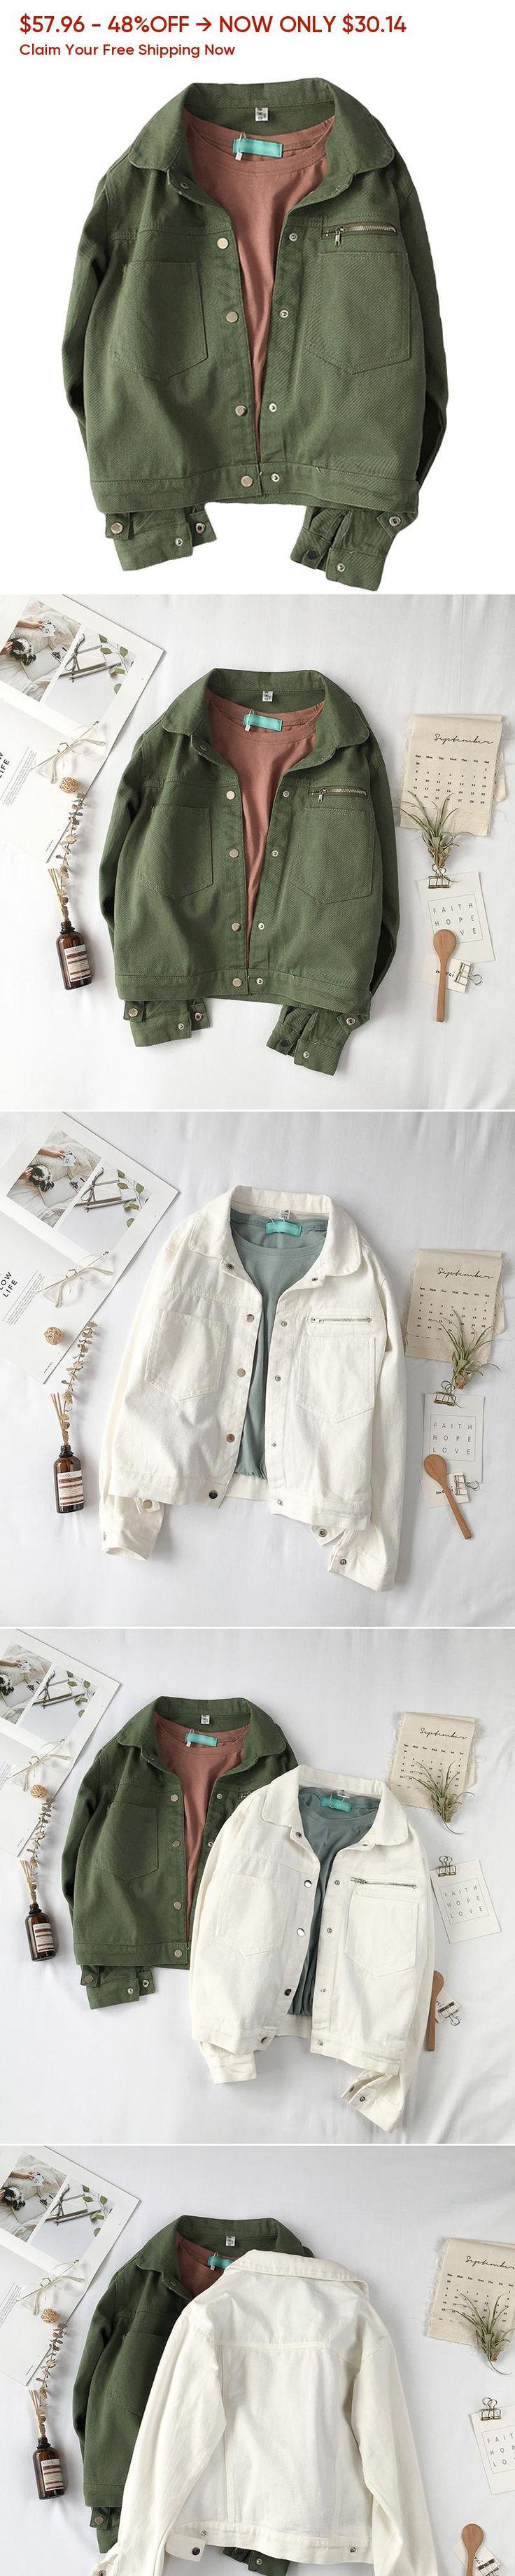 Solid Color Jean Women Jacket 2019 Spring Fashion Brand Basic Coat Harajuku BF Series Jeans Jacket Women ArmyGreen Denim Coat